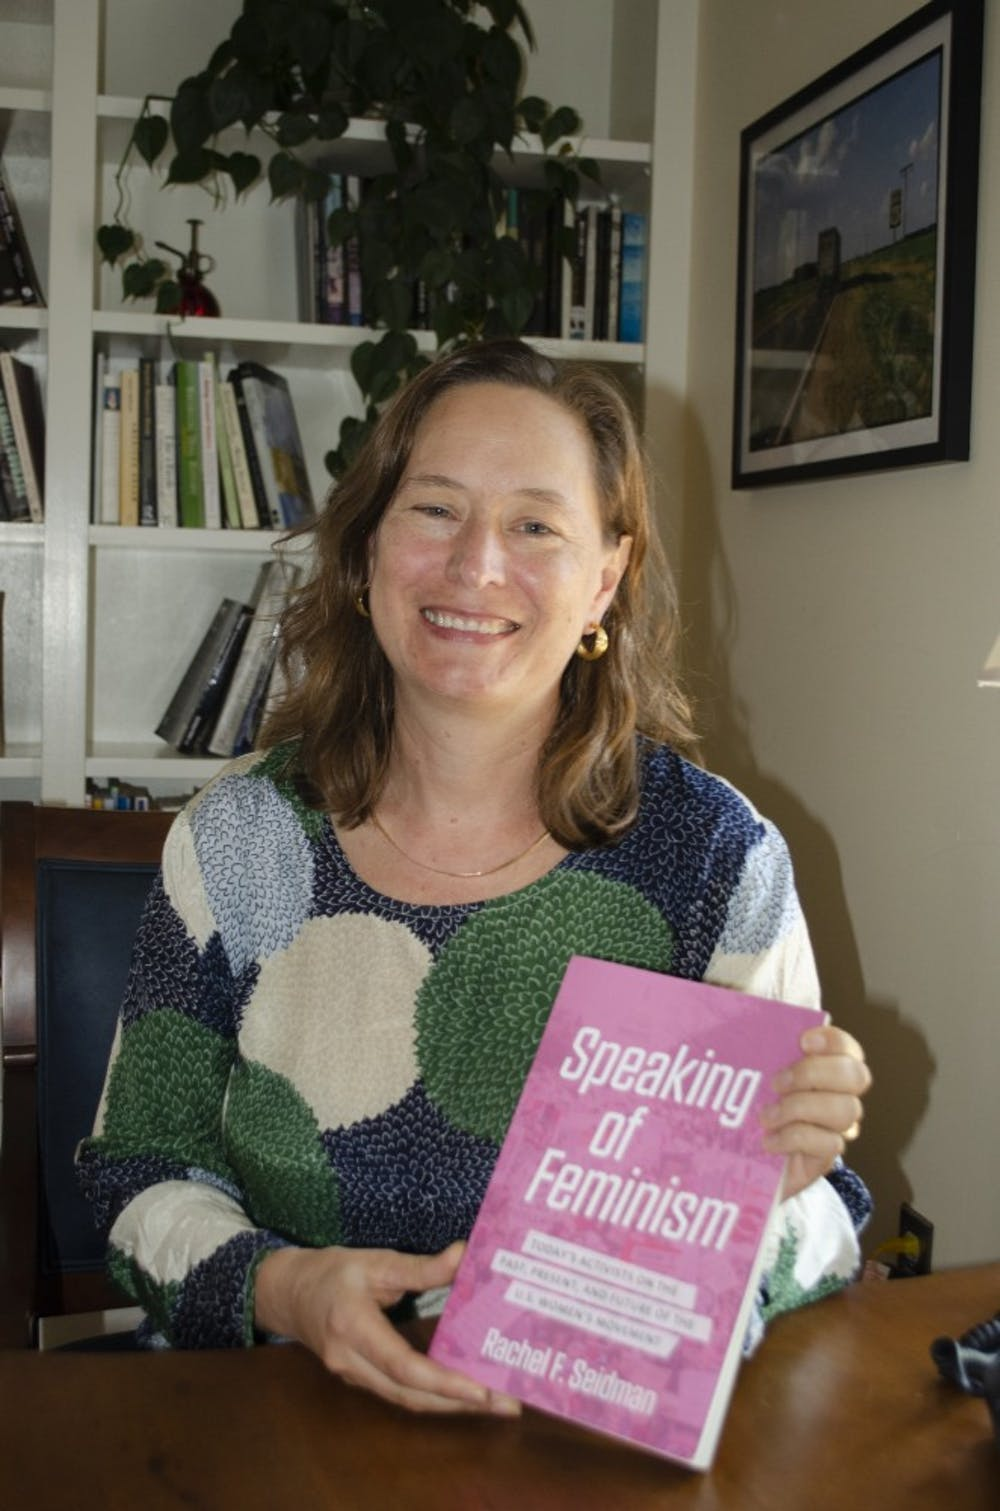 <p>Rachel Seidman holding her book, <em>Speaking of Feminism</em>.&nbsp;</p>